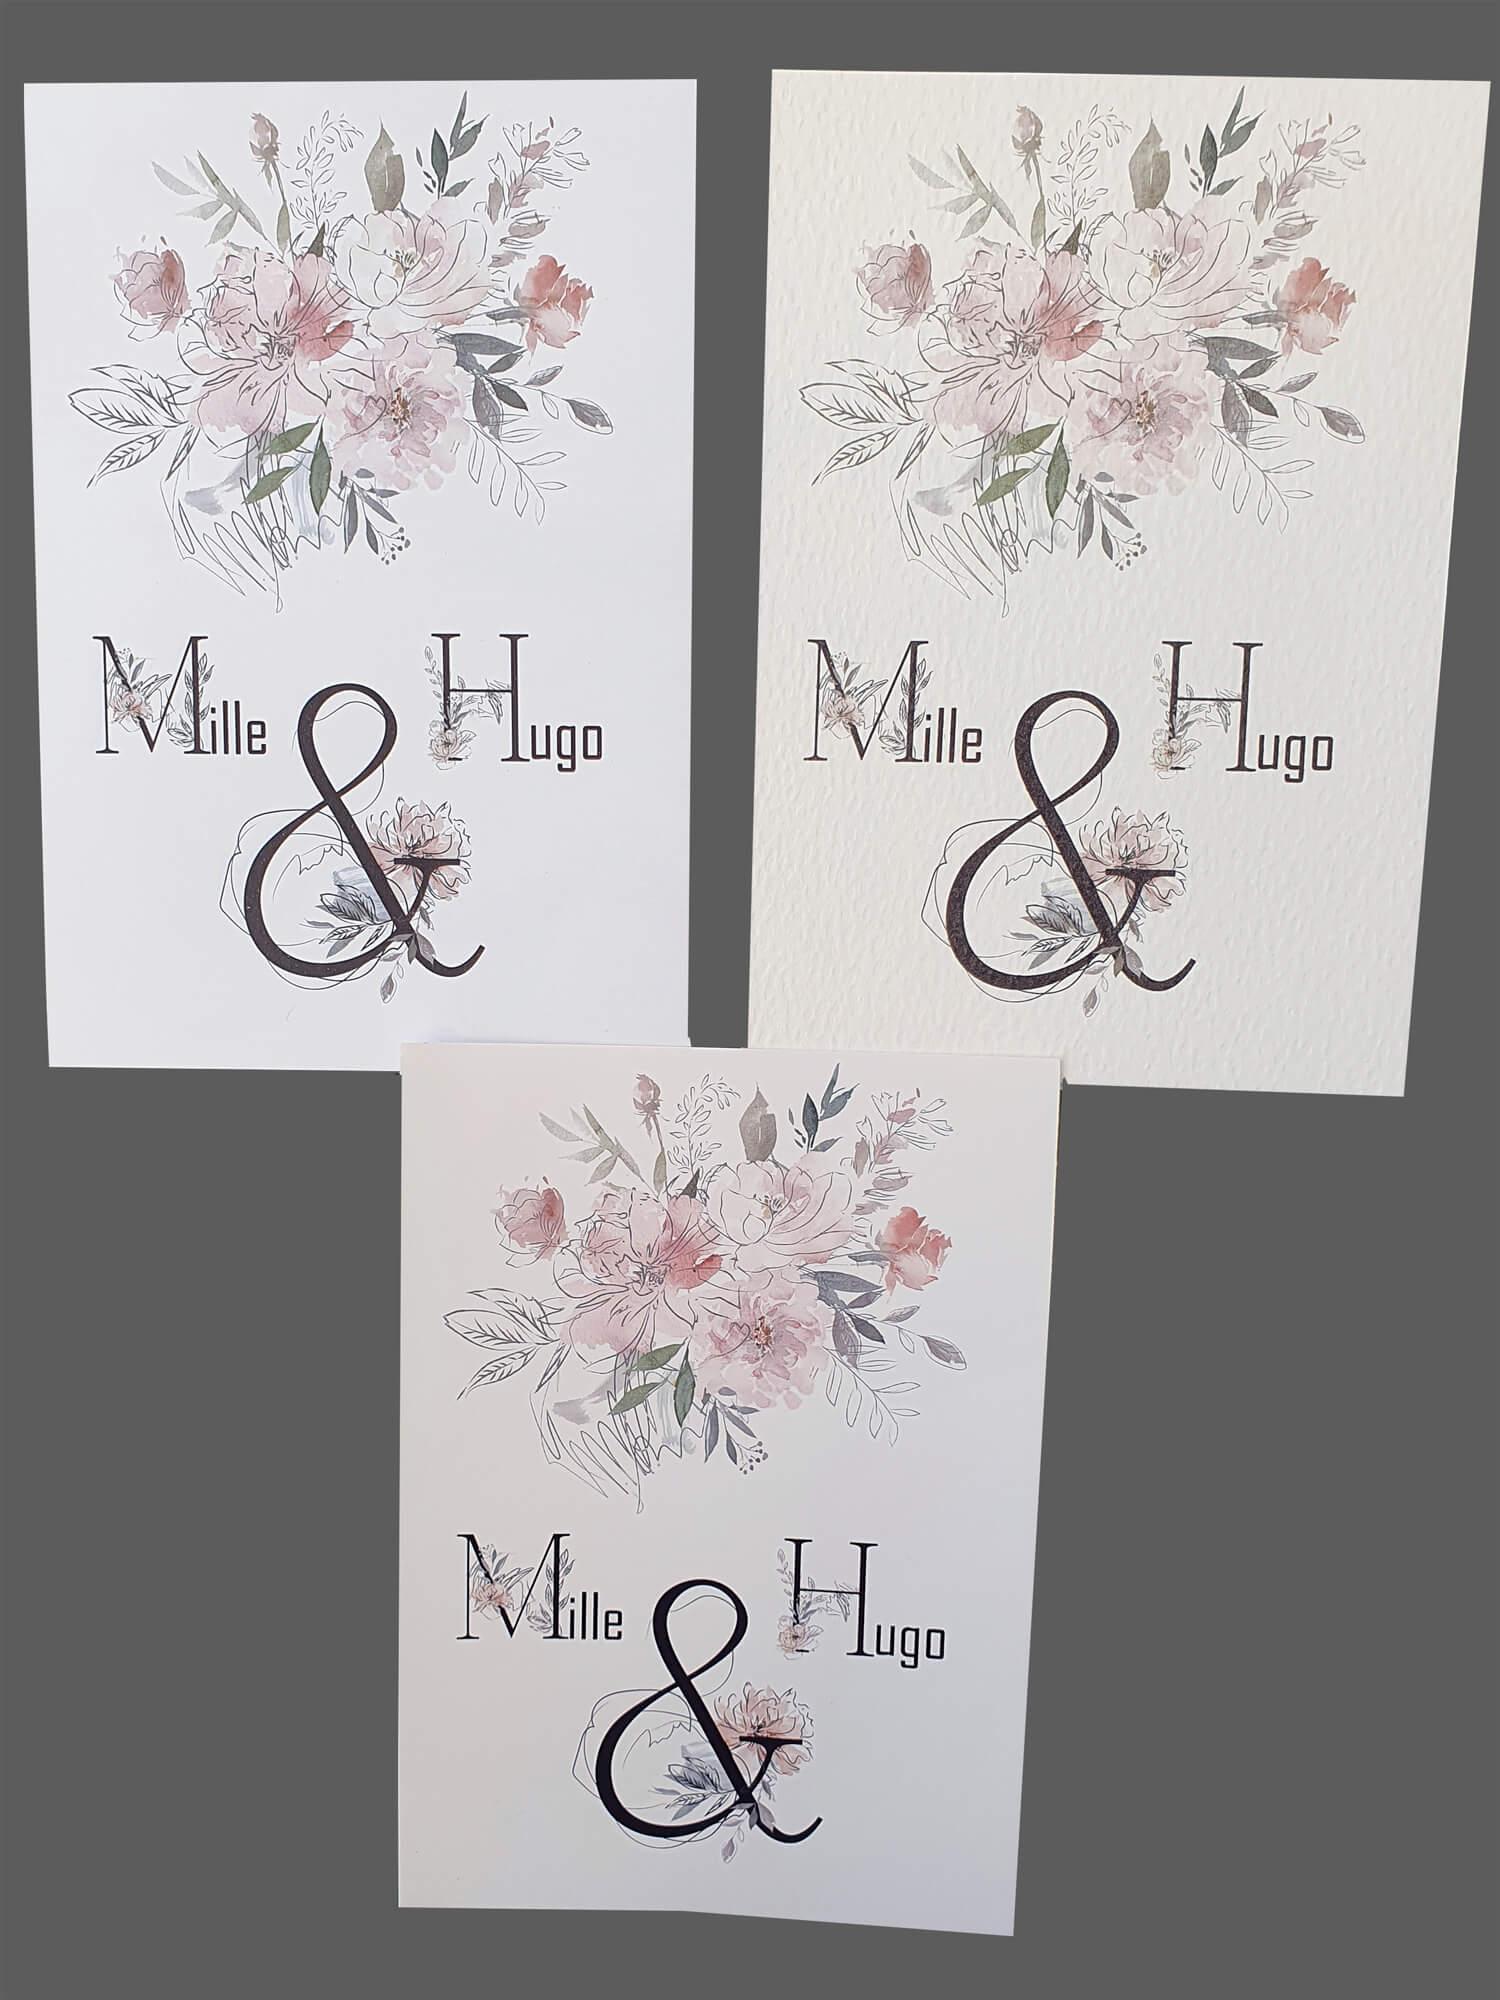 Print af invitationer på lukuskarton